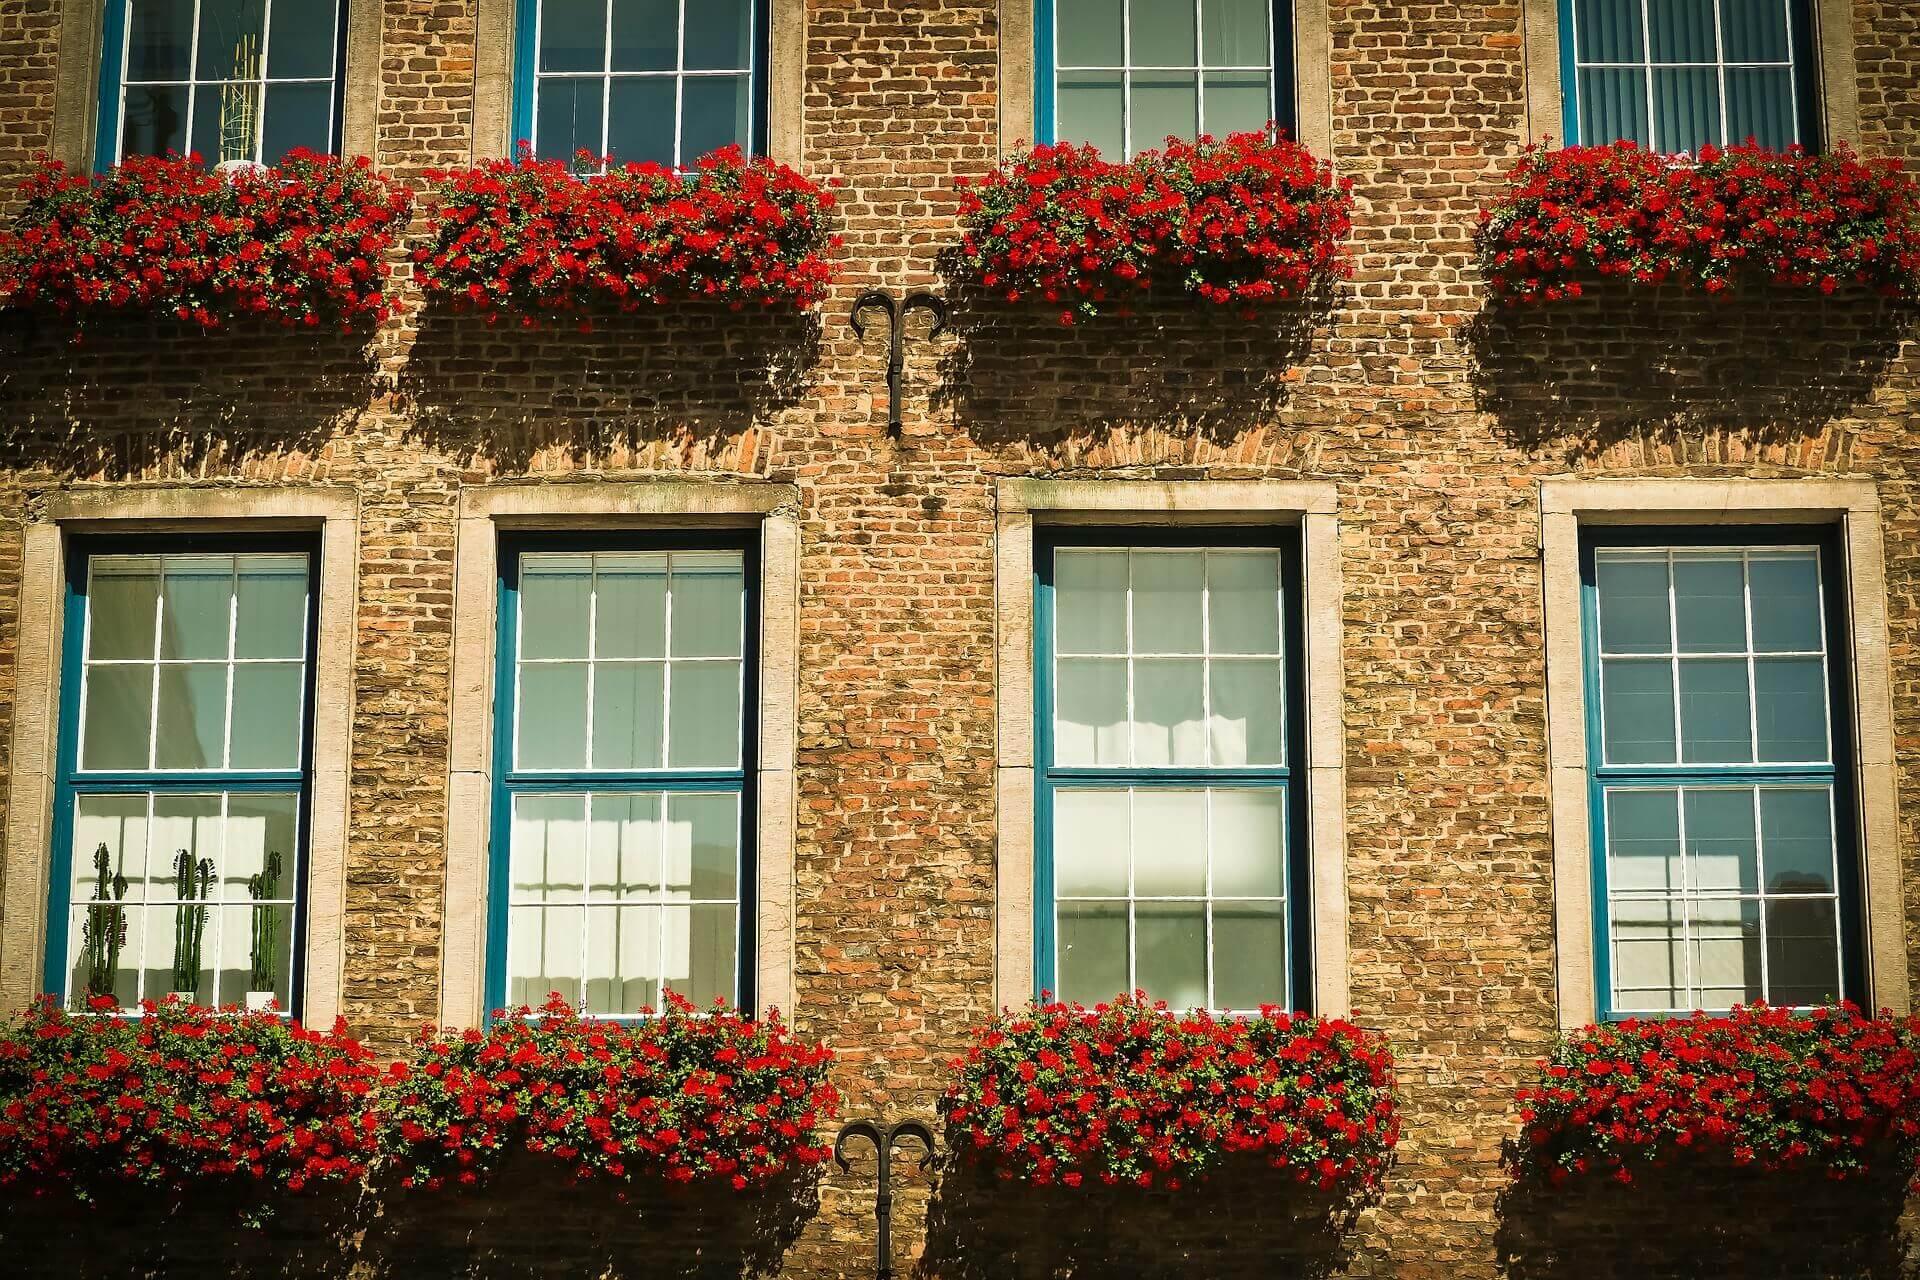 architecture windows